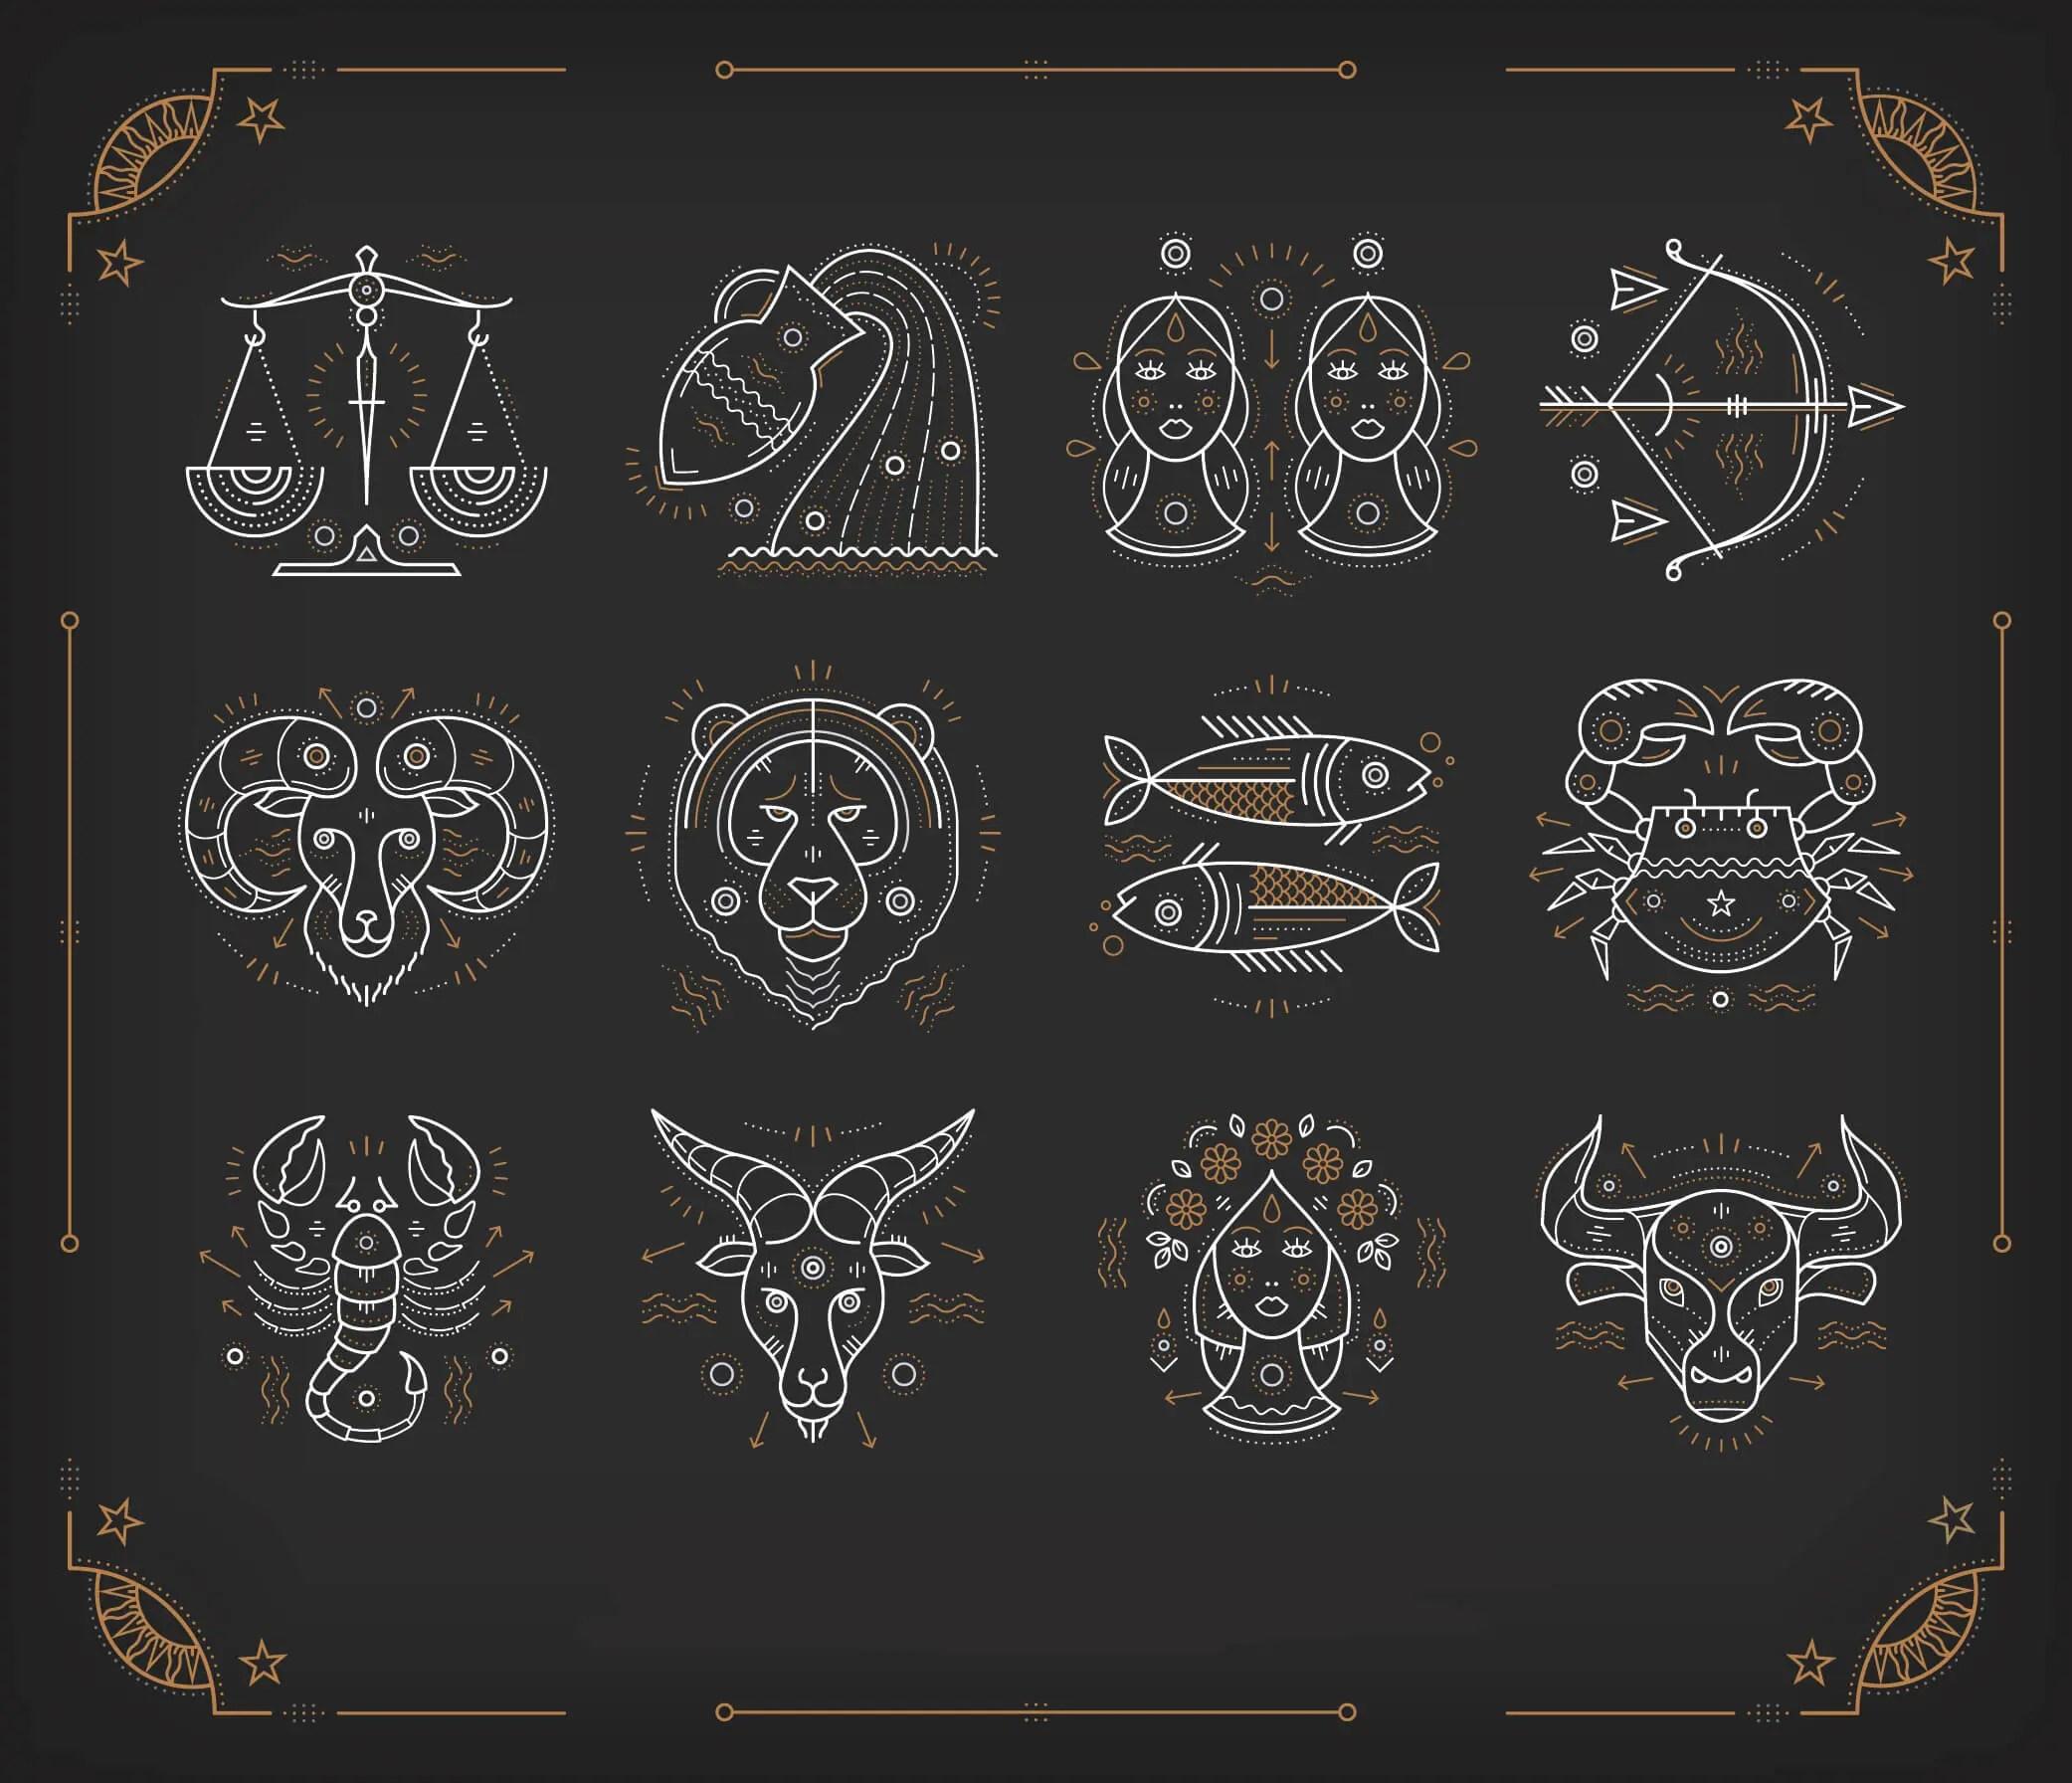 All zodiac